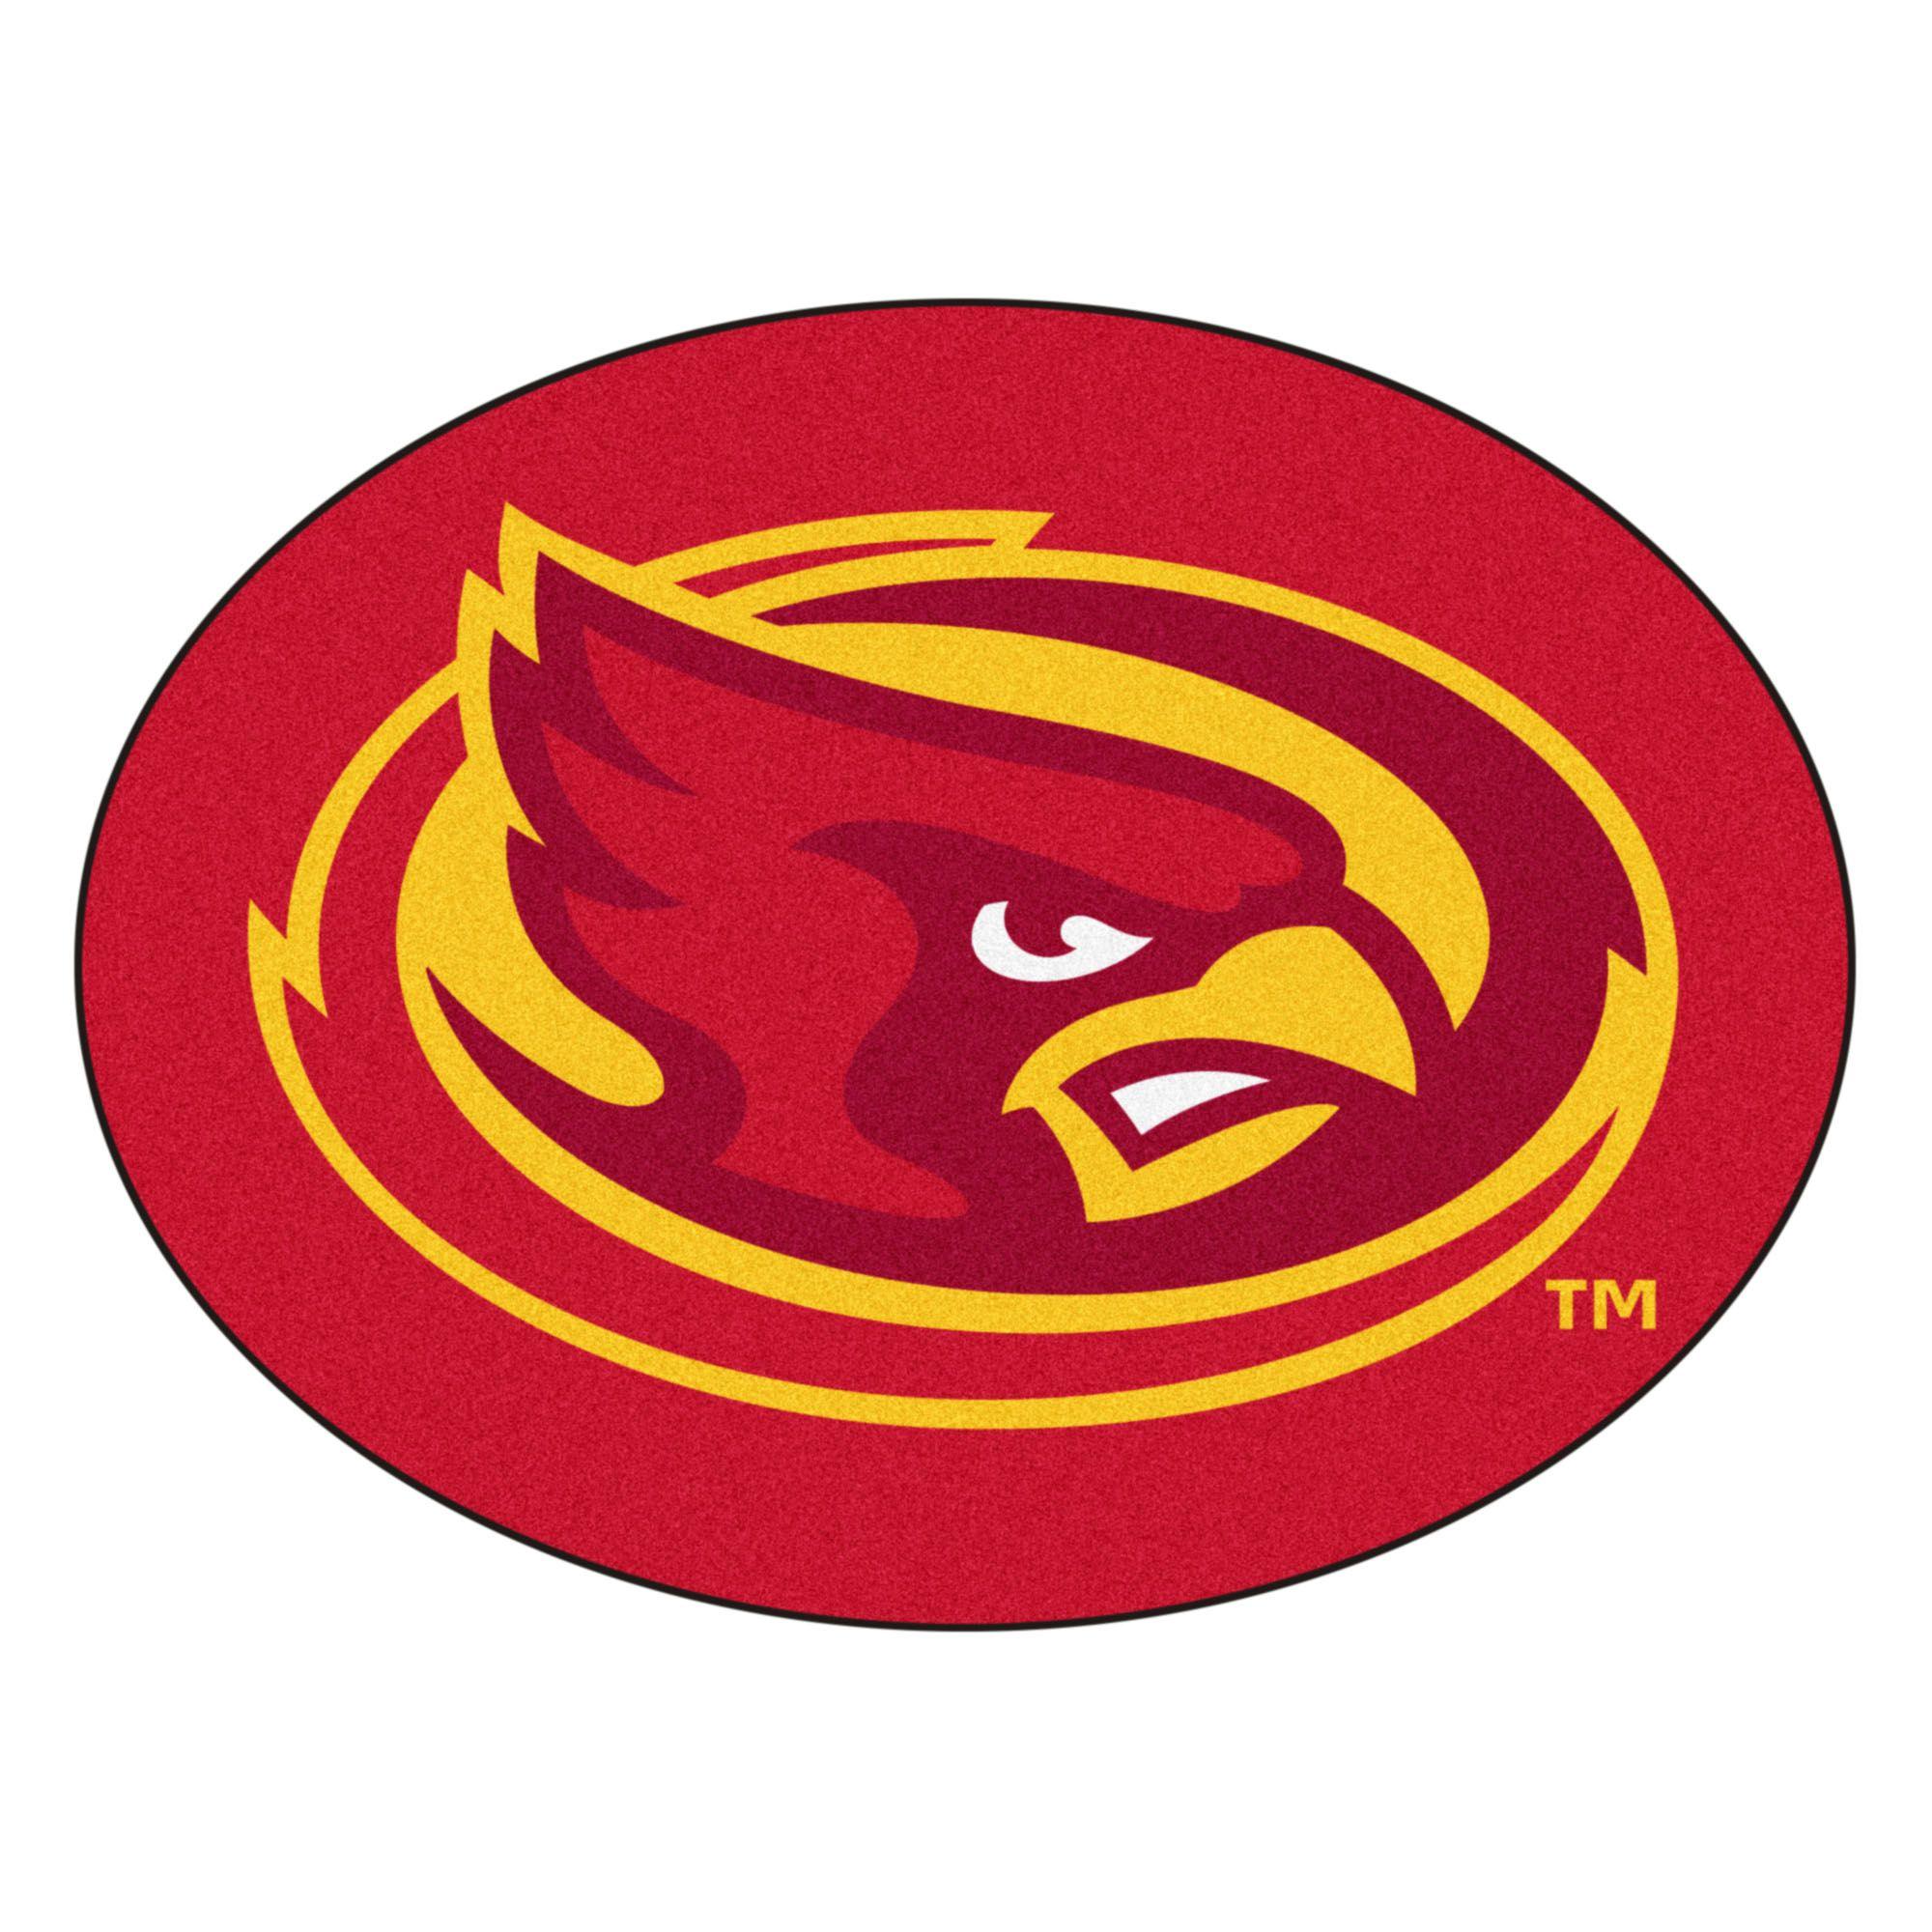 Ncaa Iowa State University Cyclones Mascot Novelty Logo Shaped Area Rug In 2020 Iowa State Cyclones Iowa State University Iowa State